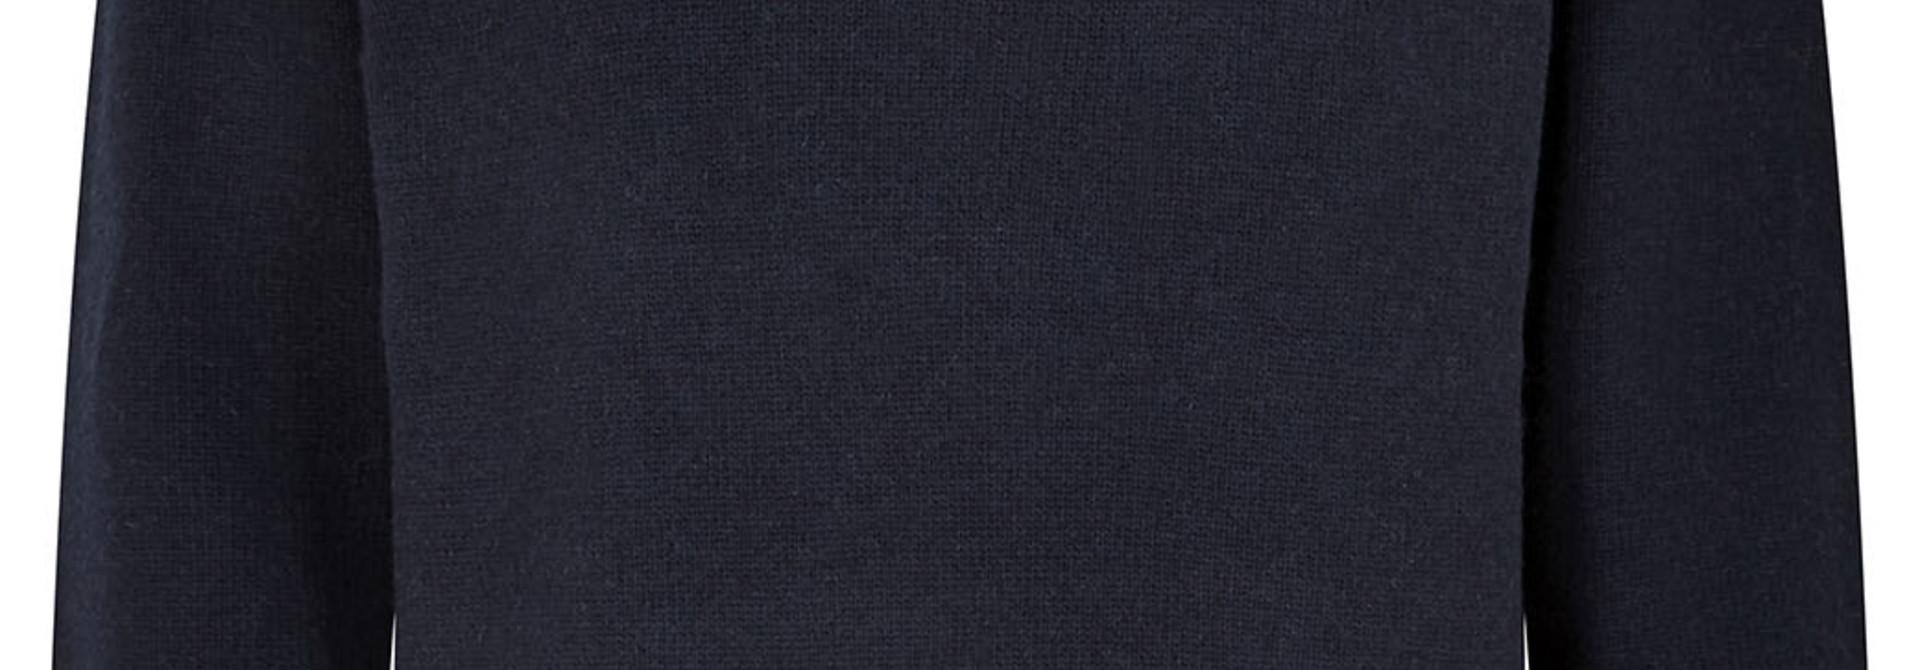 Dubarry Nolan Gebreide - Trui Navy